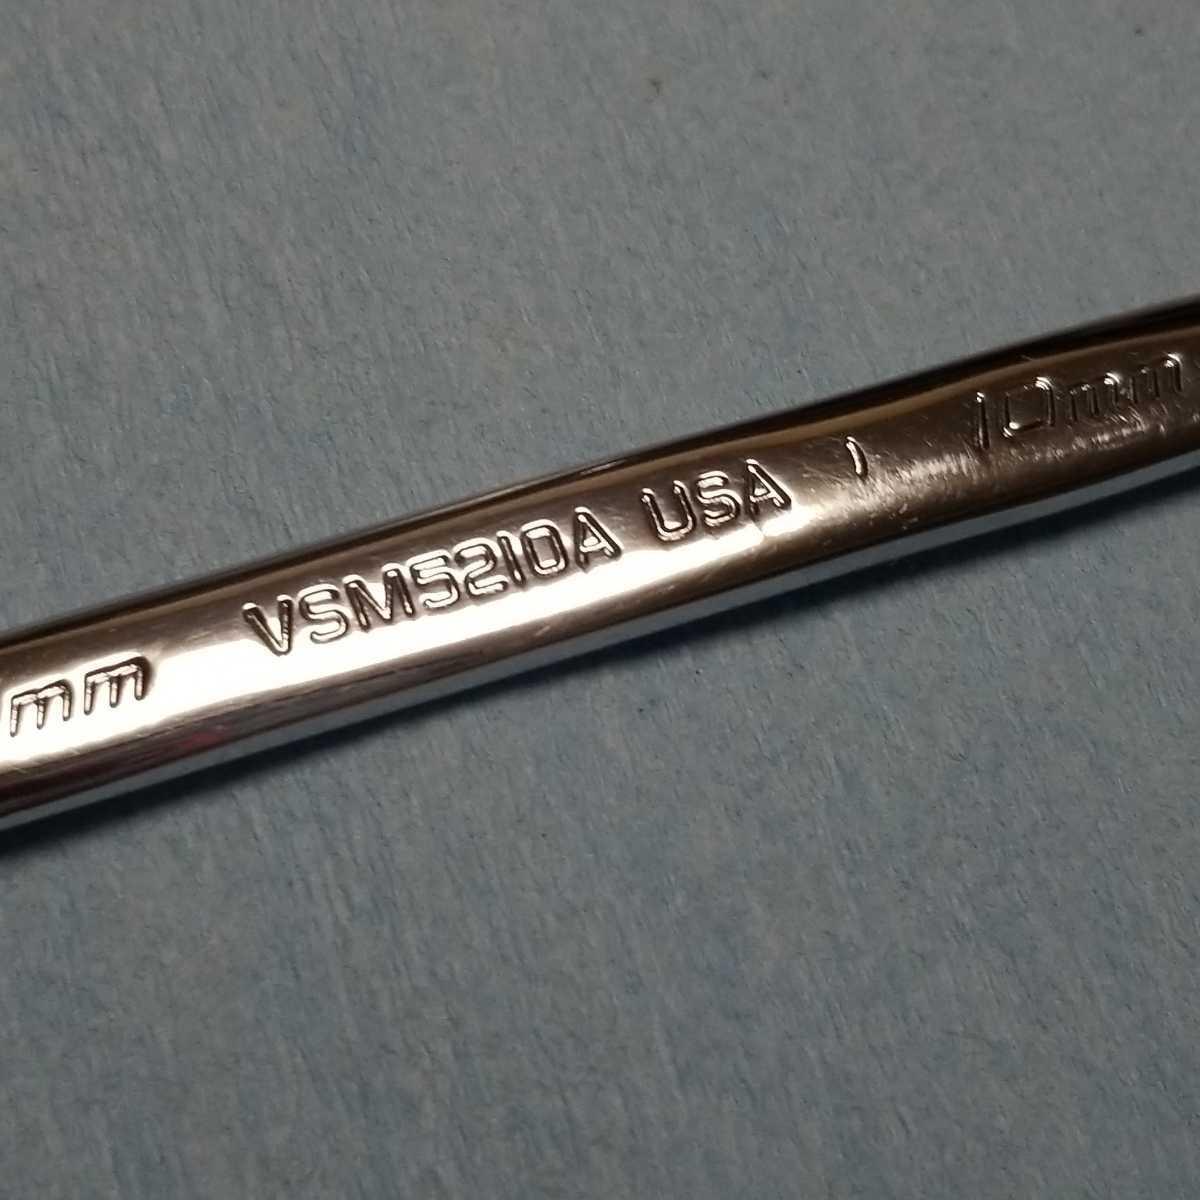 10mm スナップオン 4アングル スパナ VSM5210A 約12.8cm ギザなし 中古品 保管品 SNAPON SNAP-ON Snap-on 両口スパナ_画像6